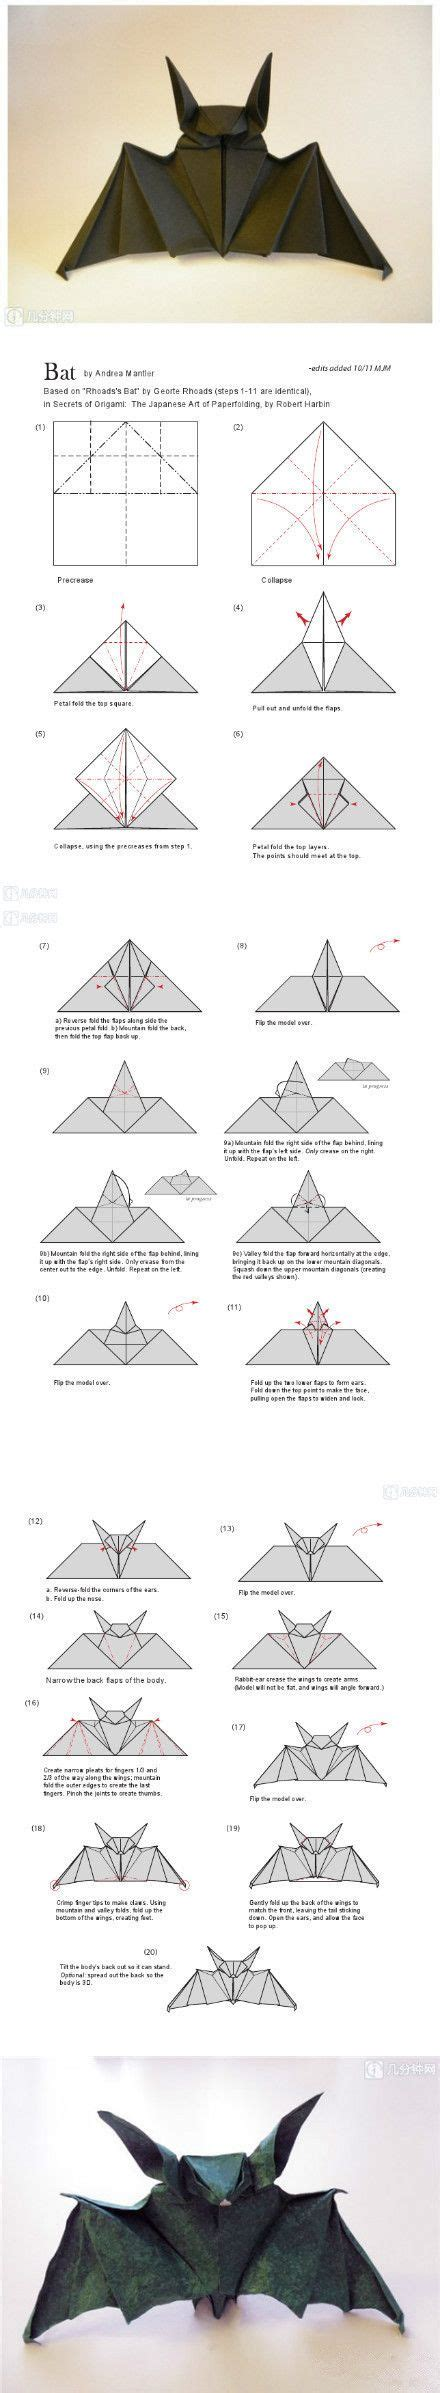 bat origami how to make an origami bat japan origami and kirigami